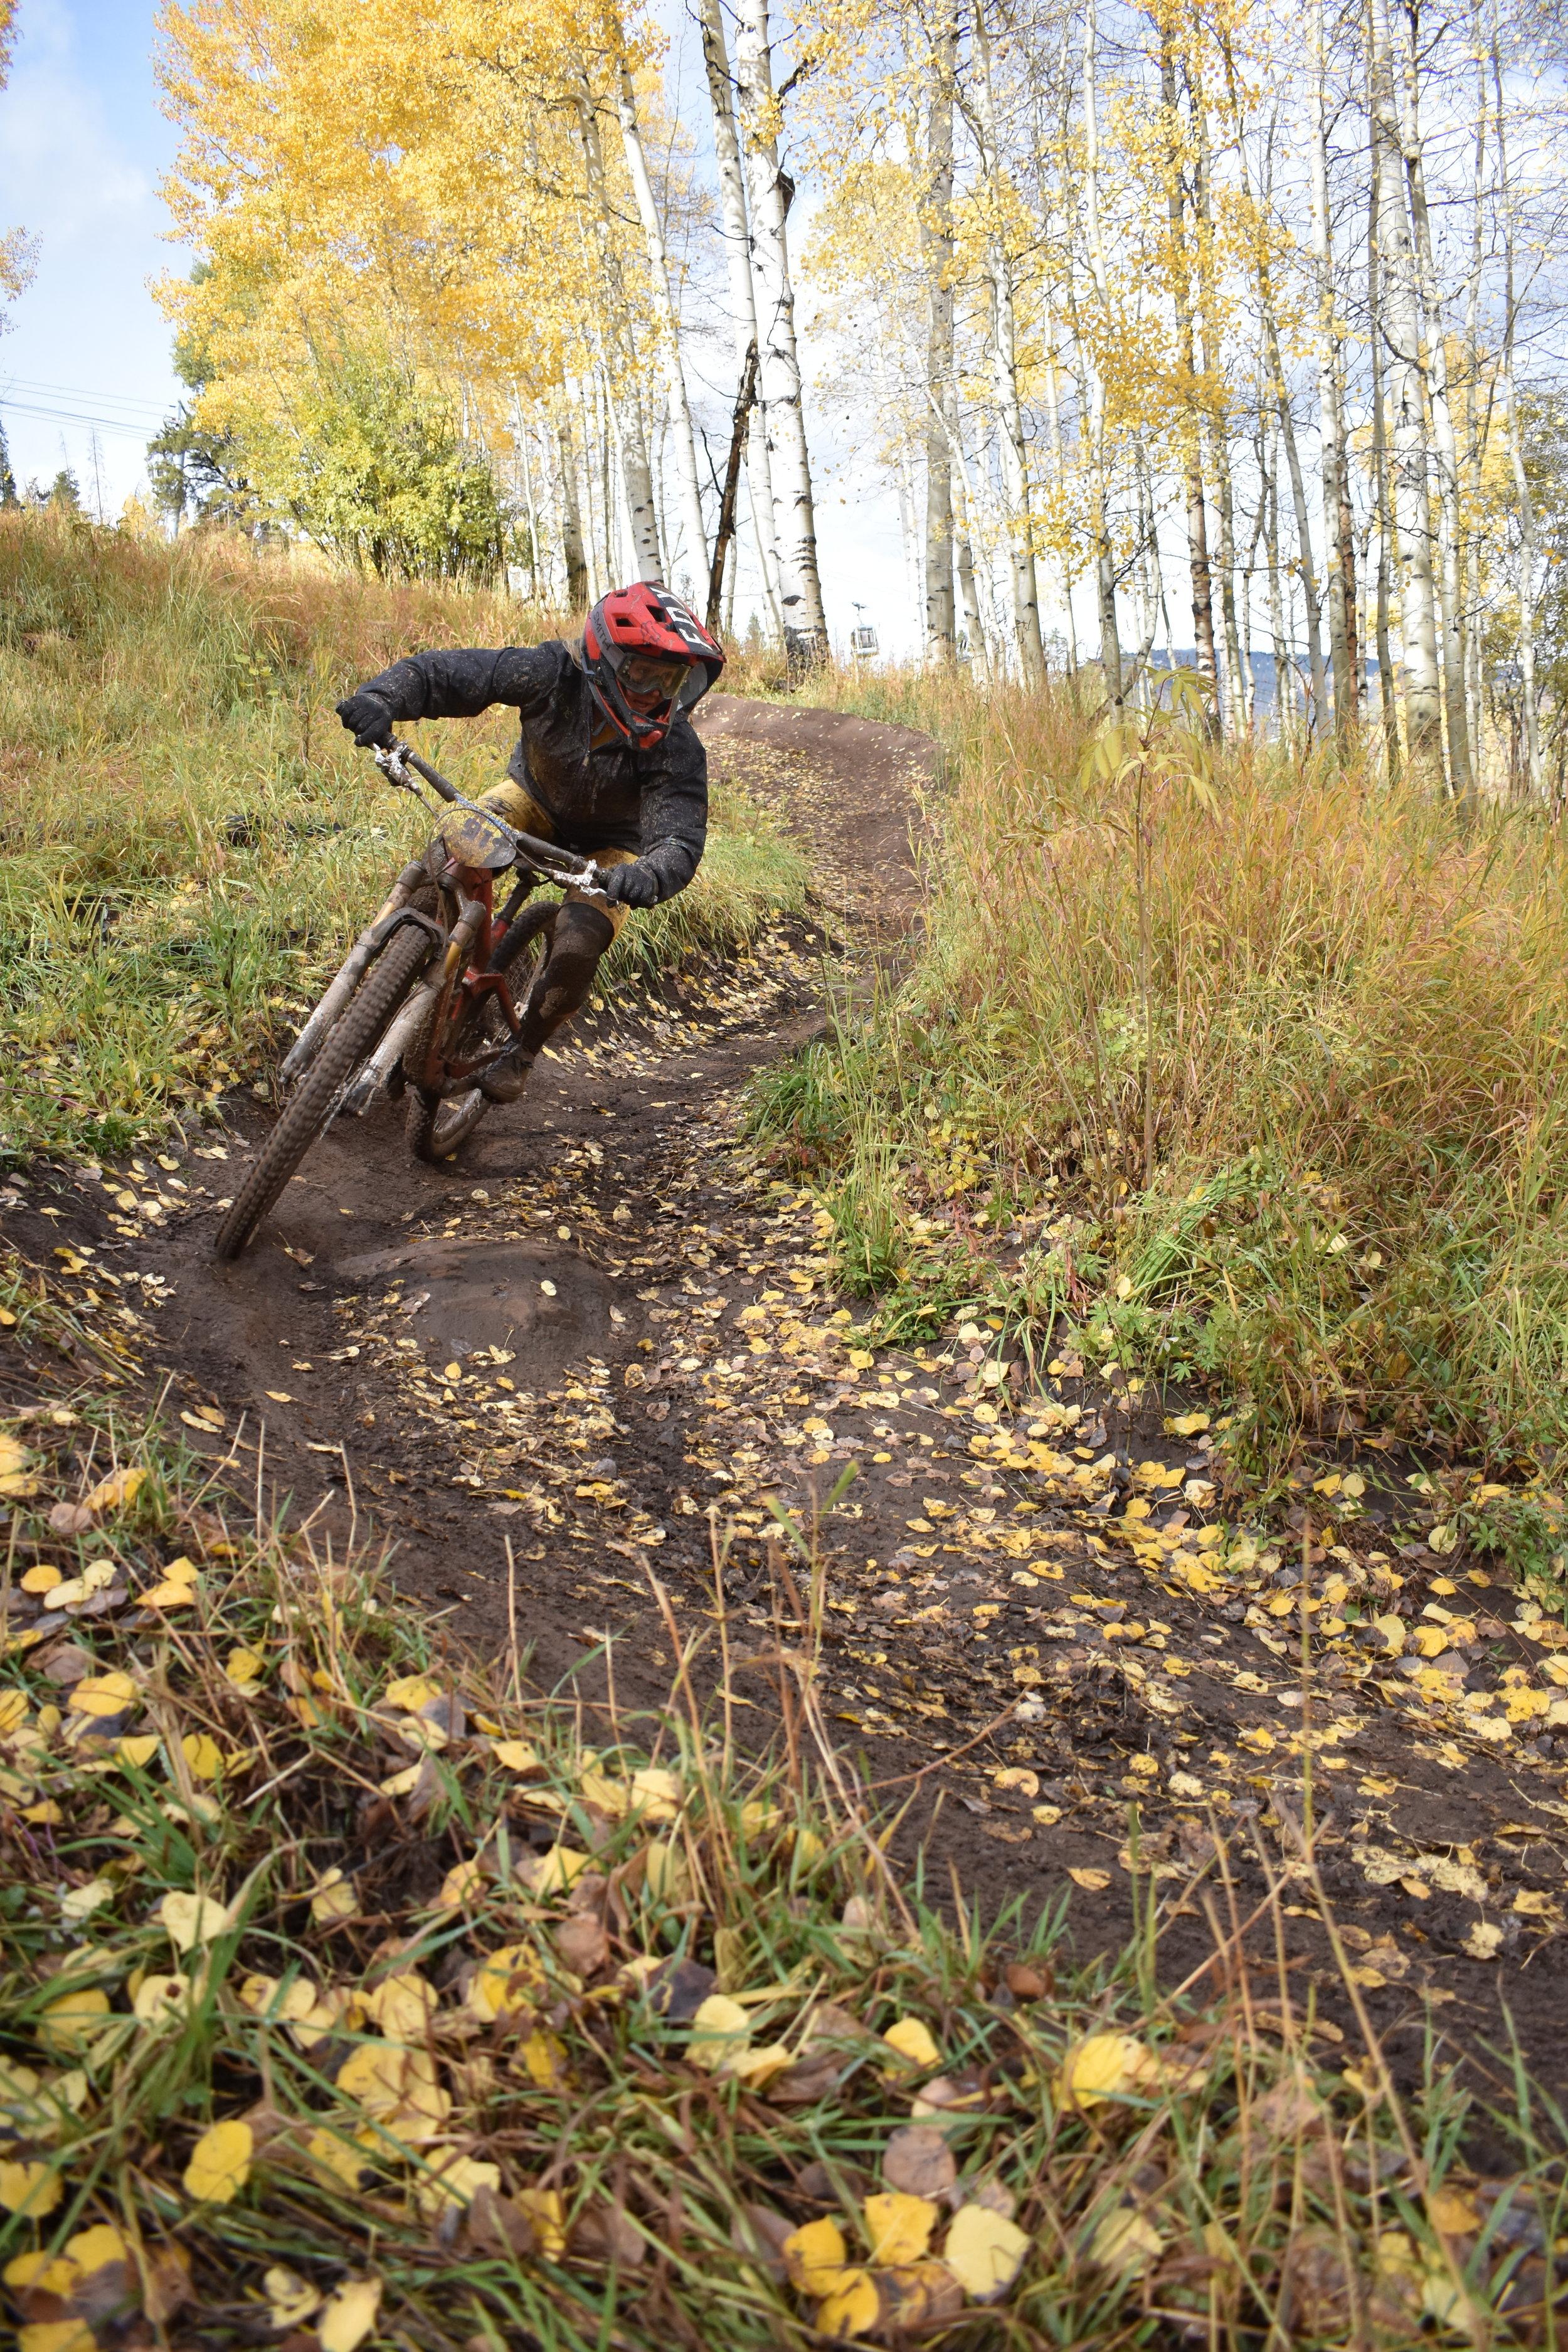 cooper racing mountain biking fitness exercise.JPG